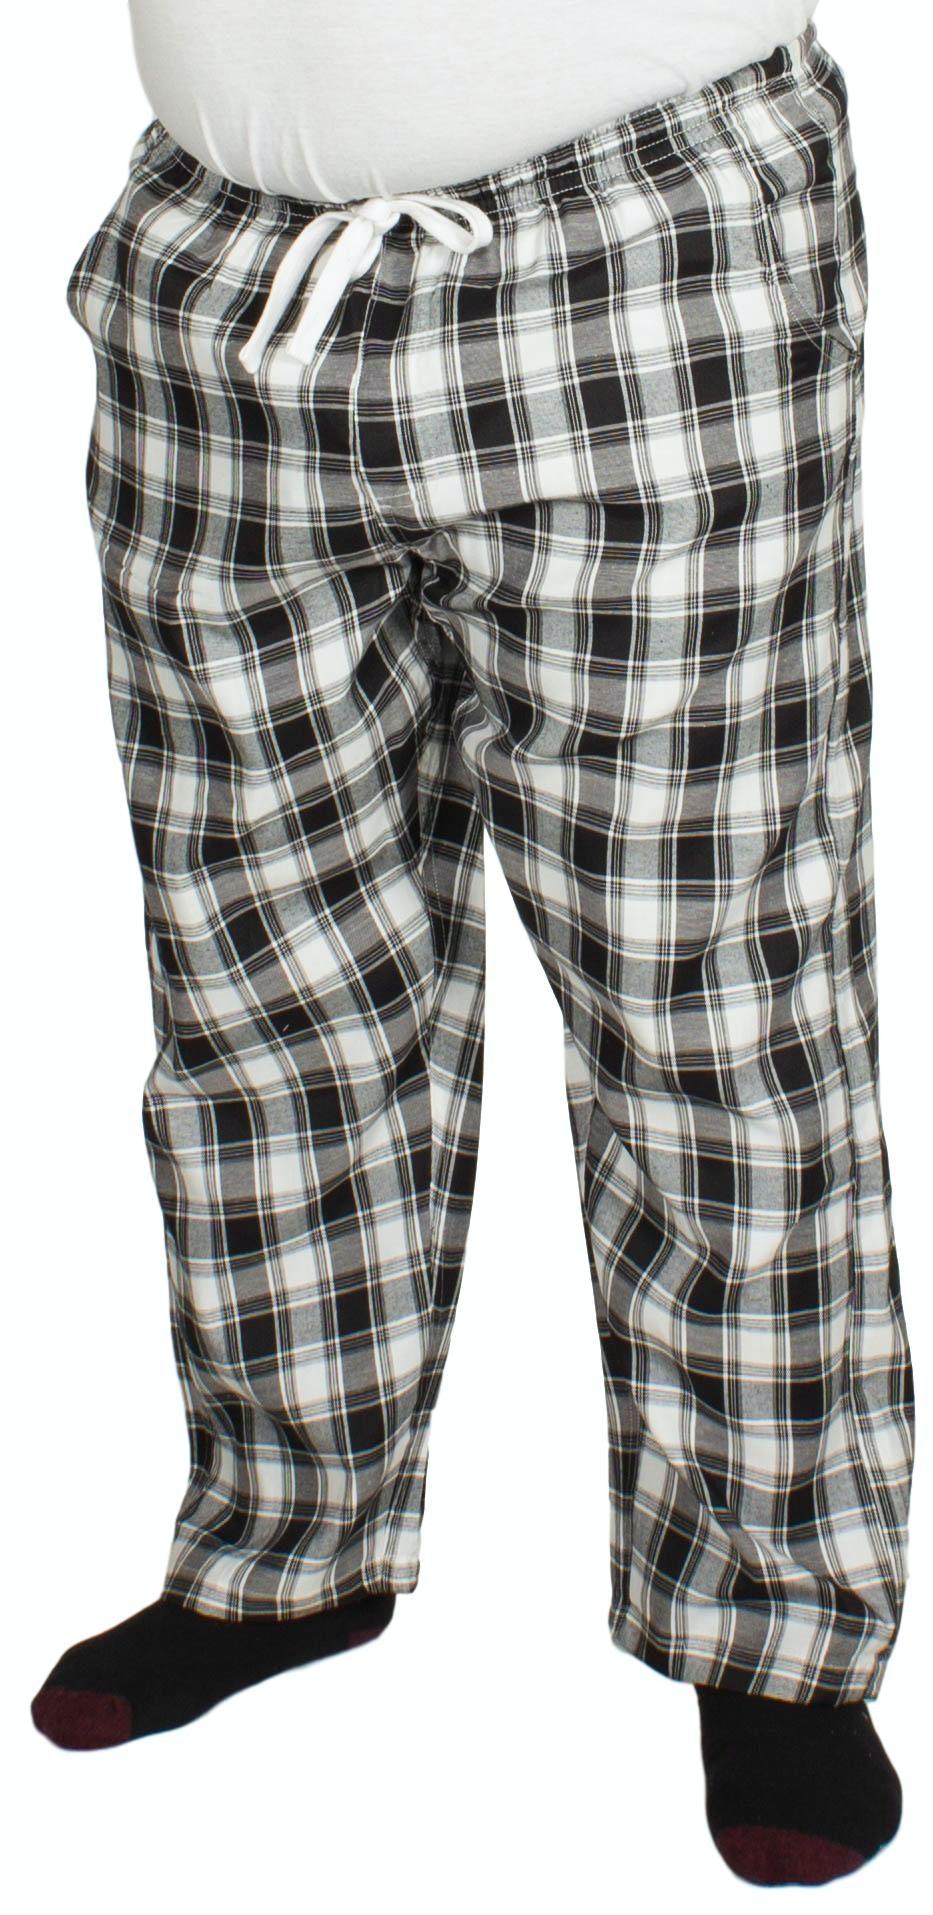 Bigdude Check Lounge Pants Black/White